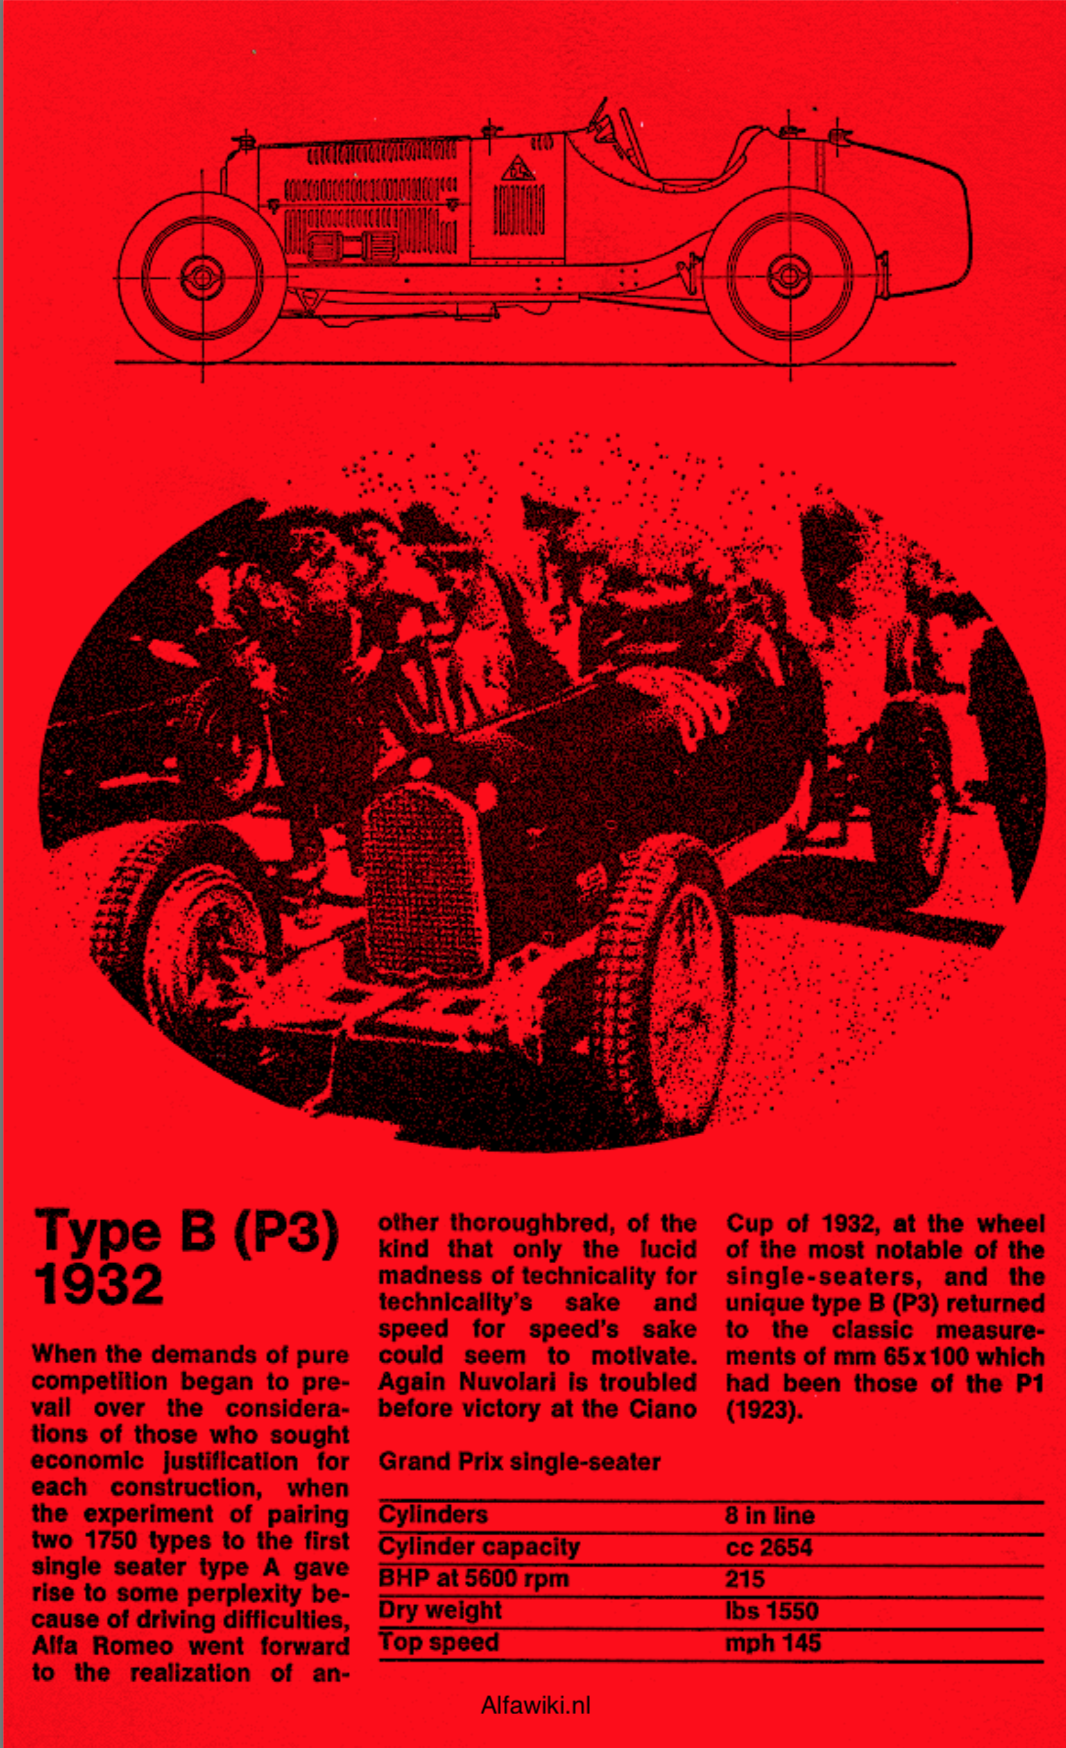 Alfa Romeo P3 flyer